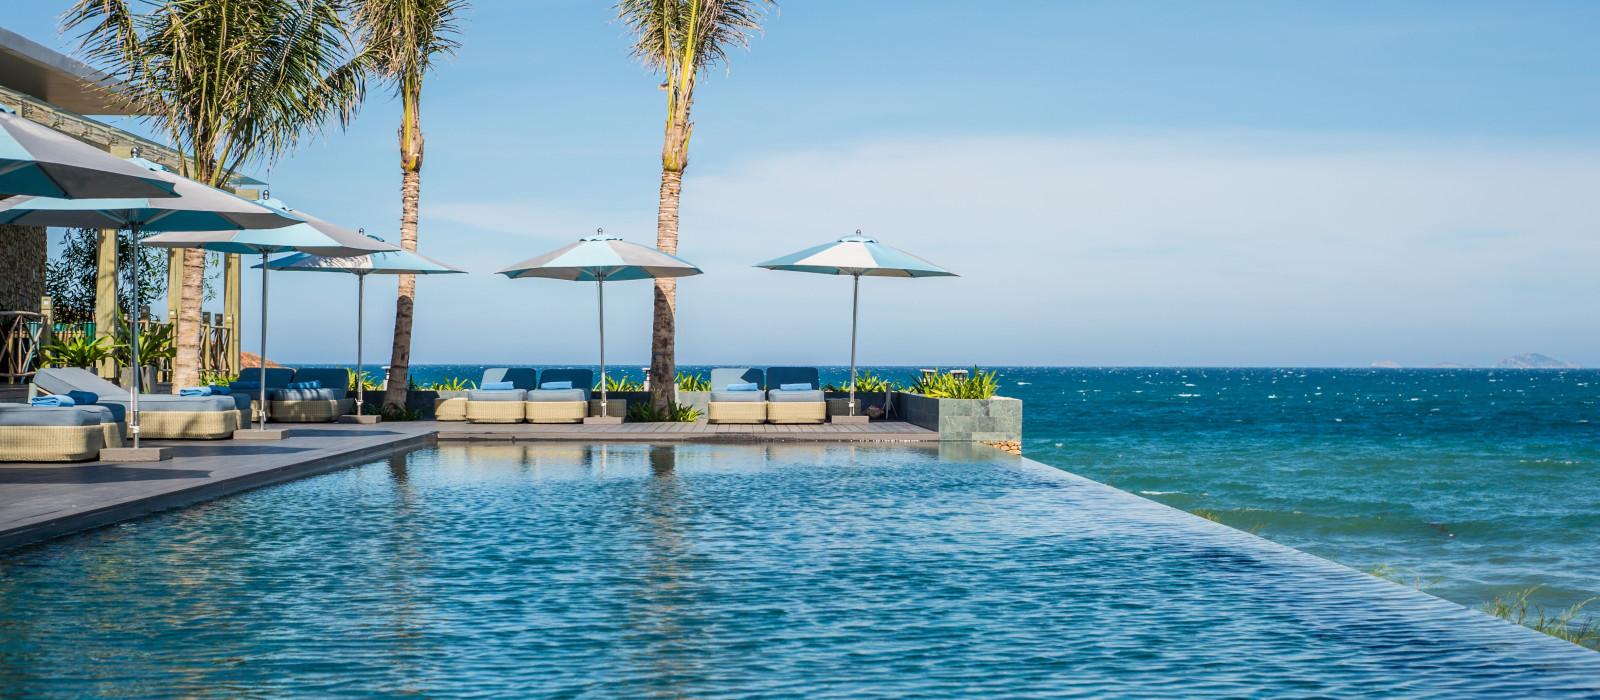 Hotel Mia Resort Nha Trang Vietnam